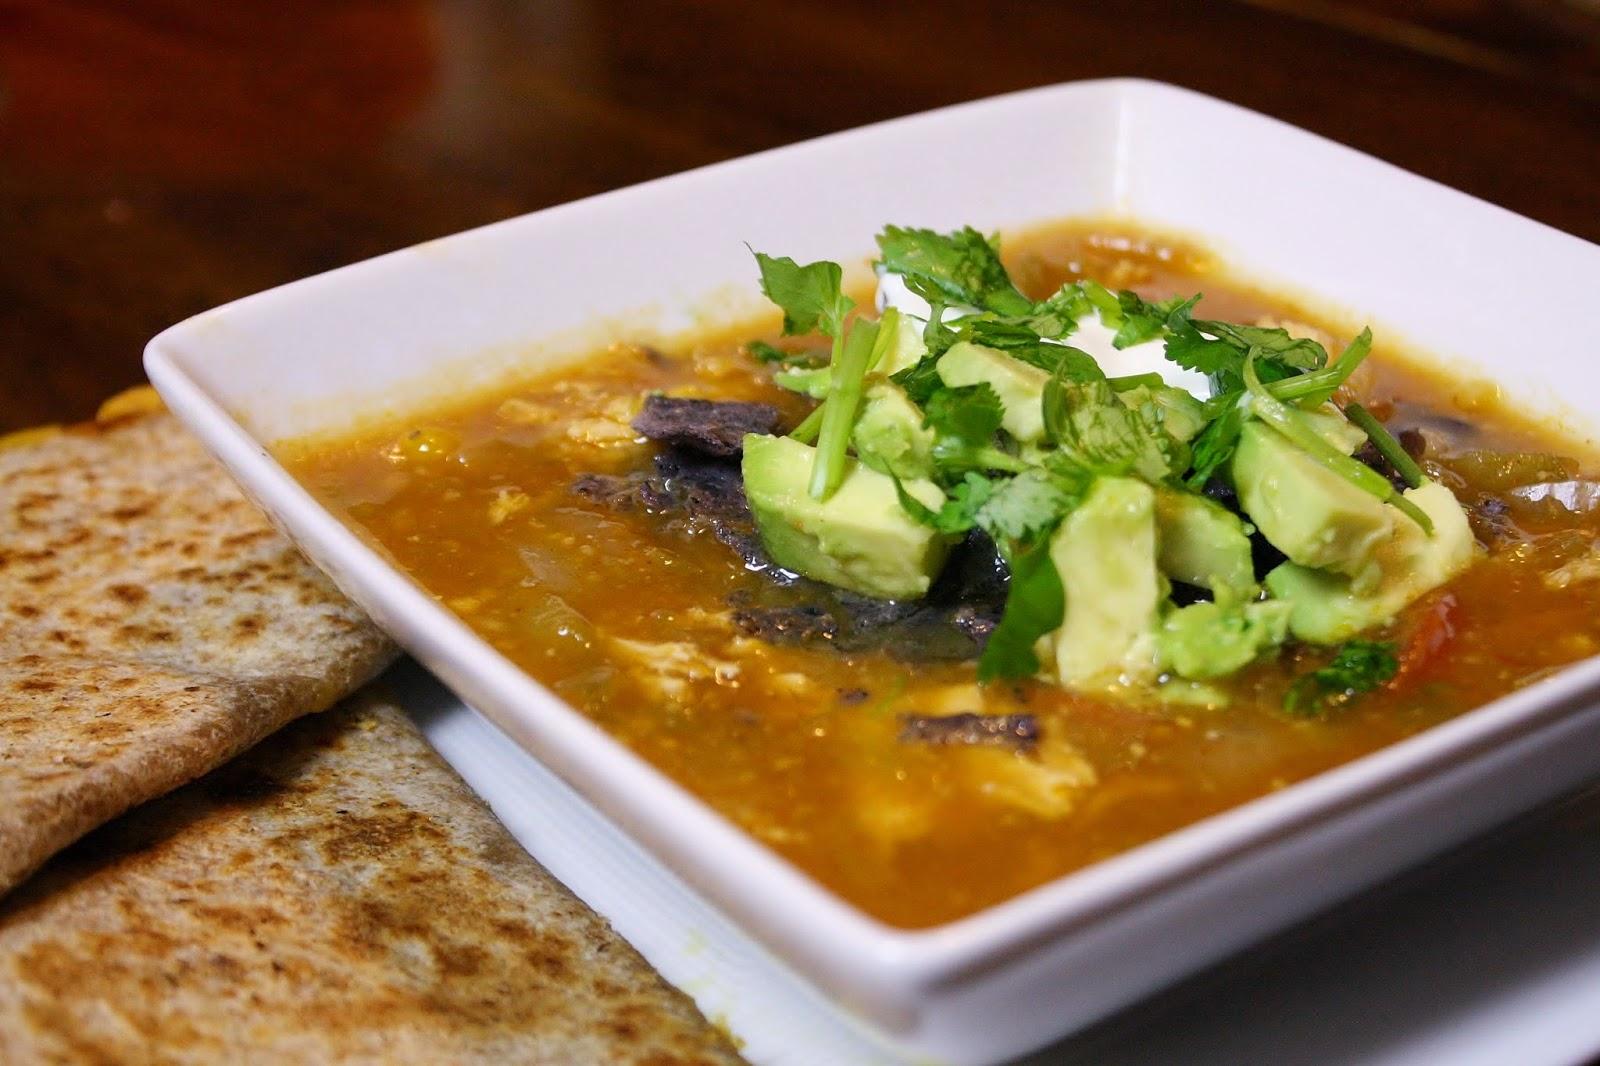 http://eatprayjuice.blogspot.com/2014/12/chicken-tortilla-soup.html